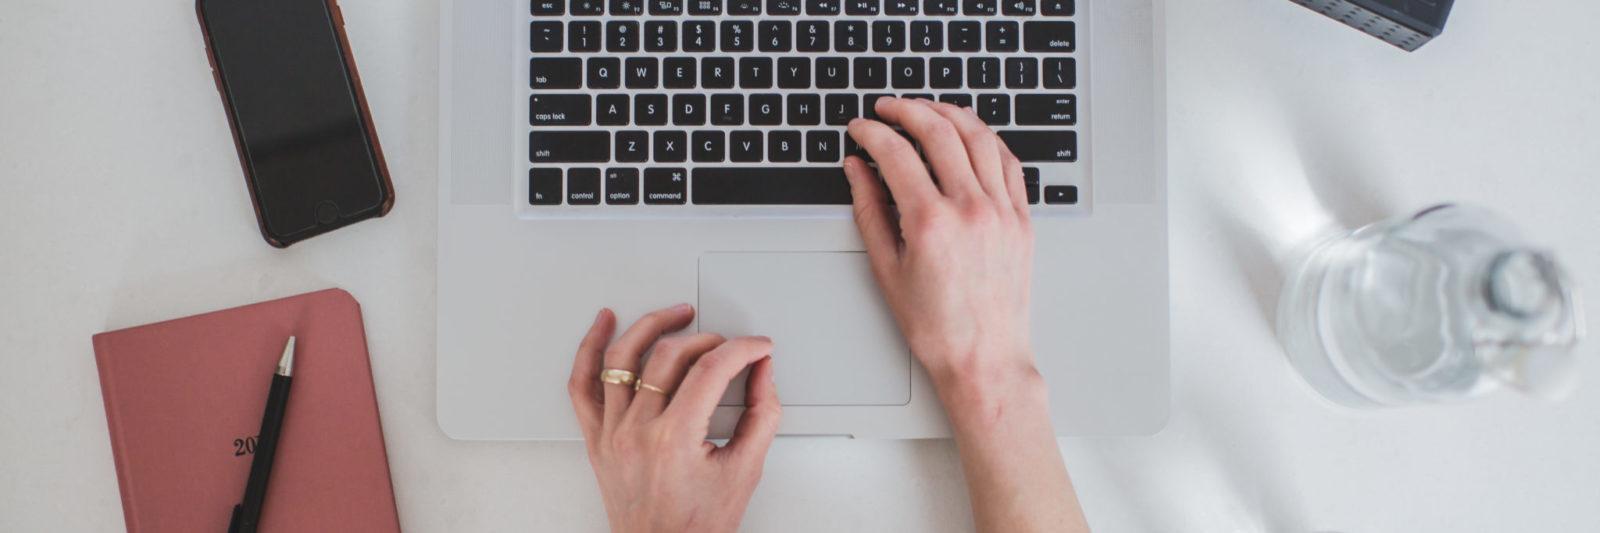 womans hands on a laptop